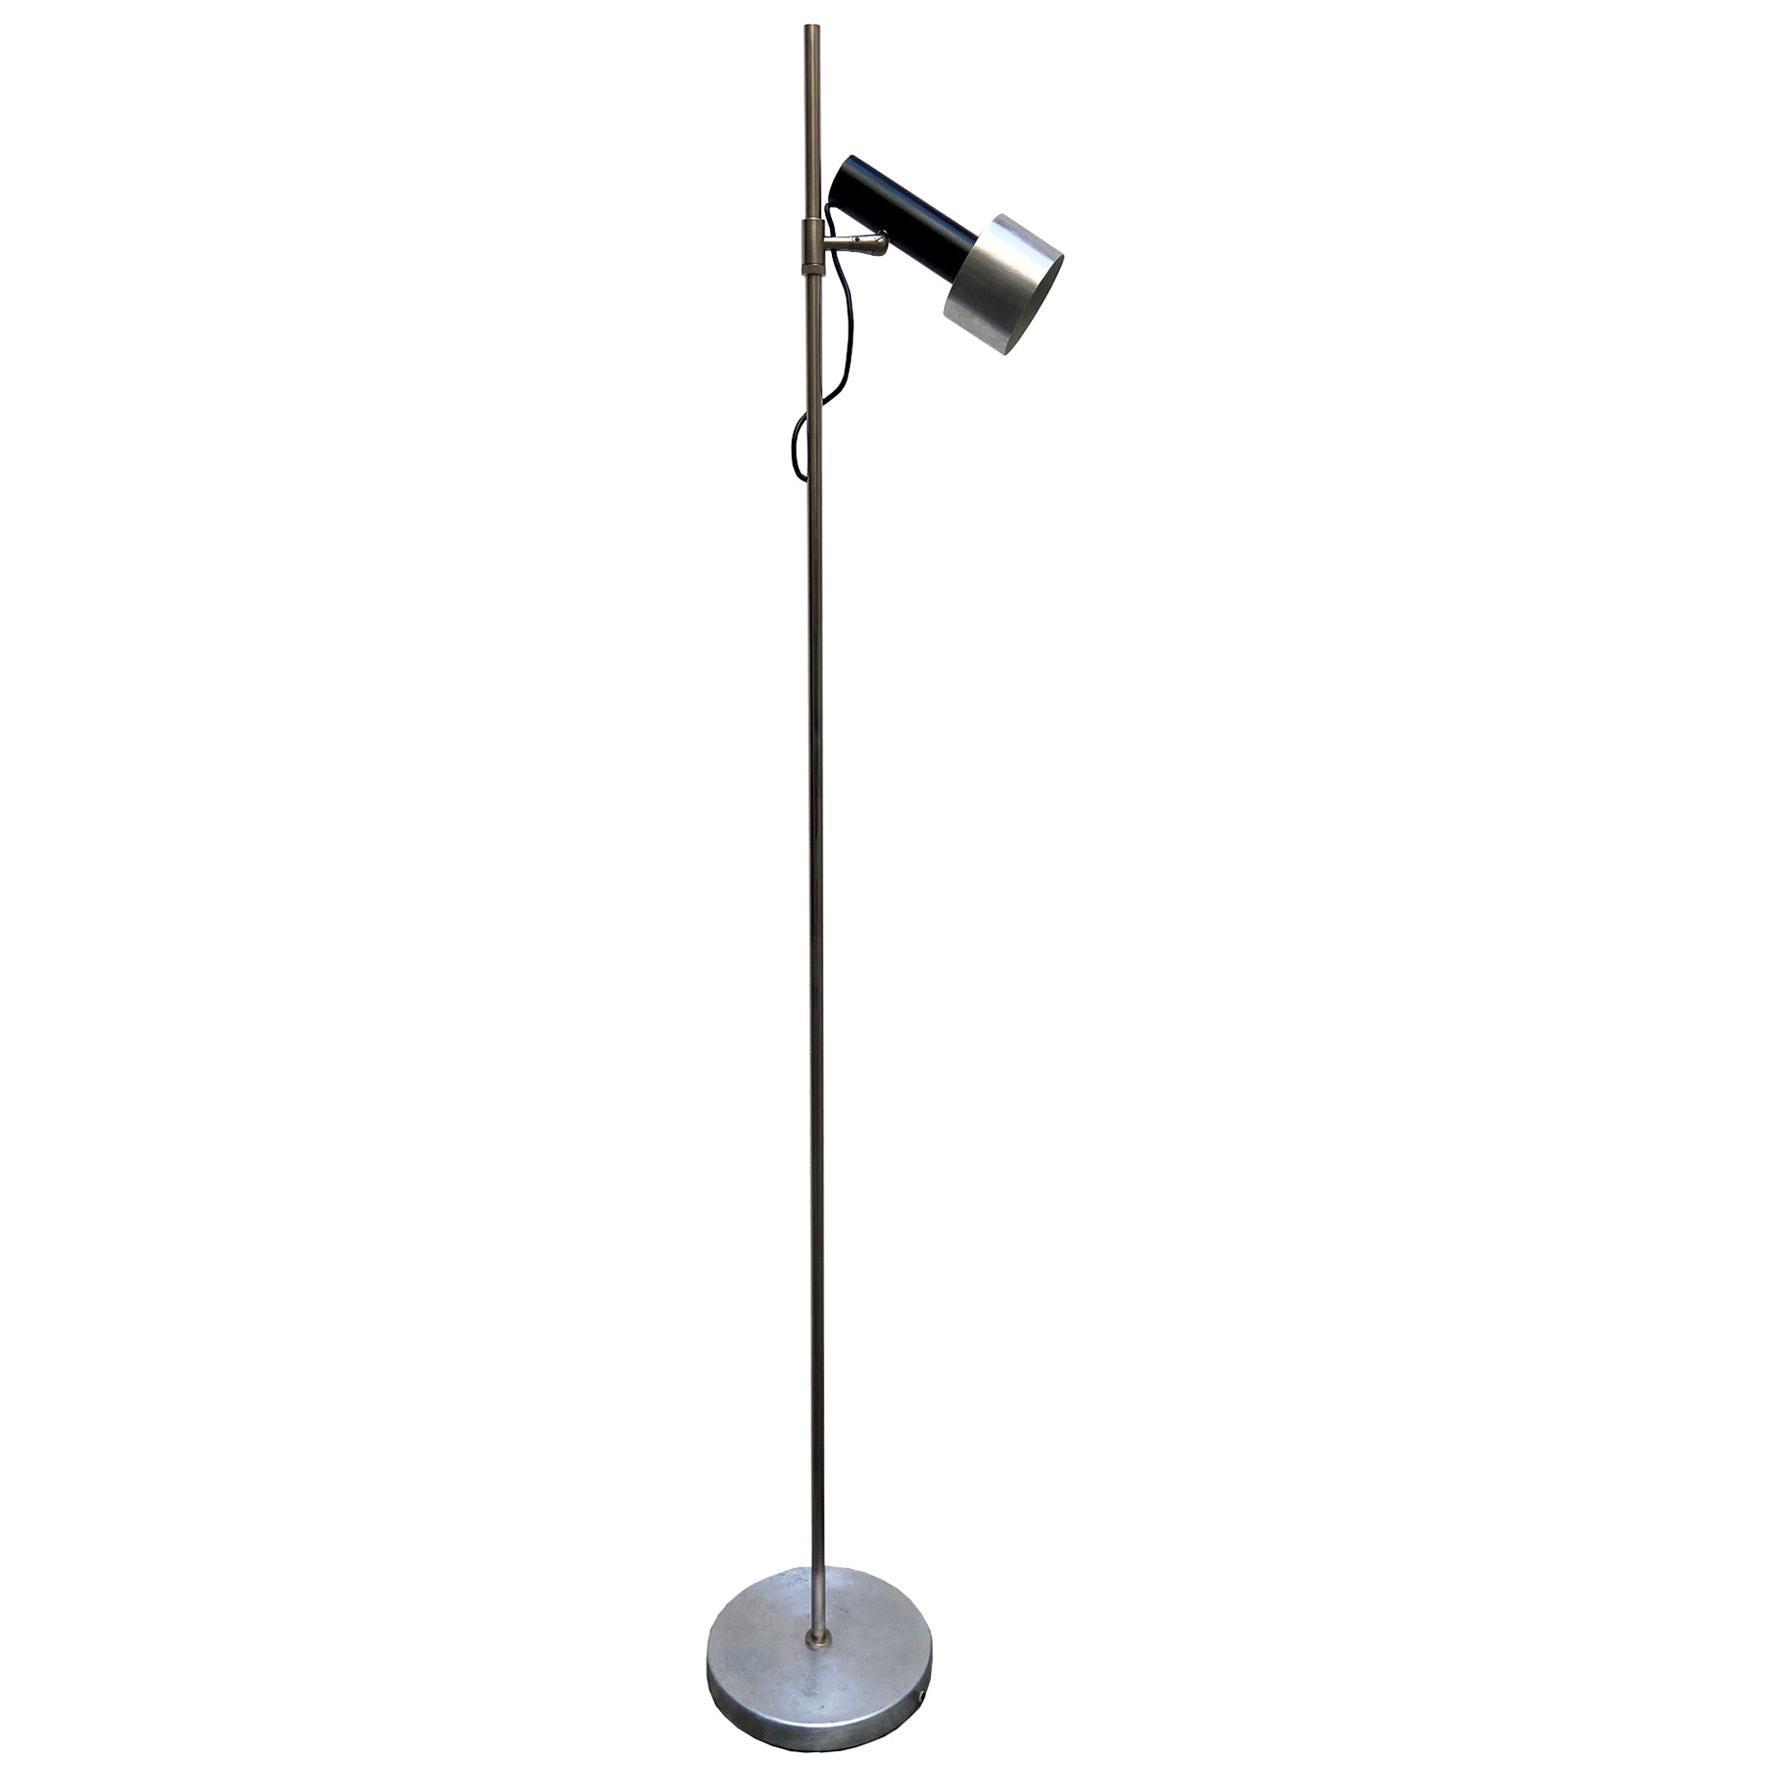 Stilux Milano Floor Lamp, Italy, 1960s